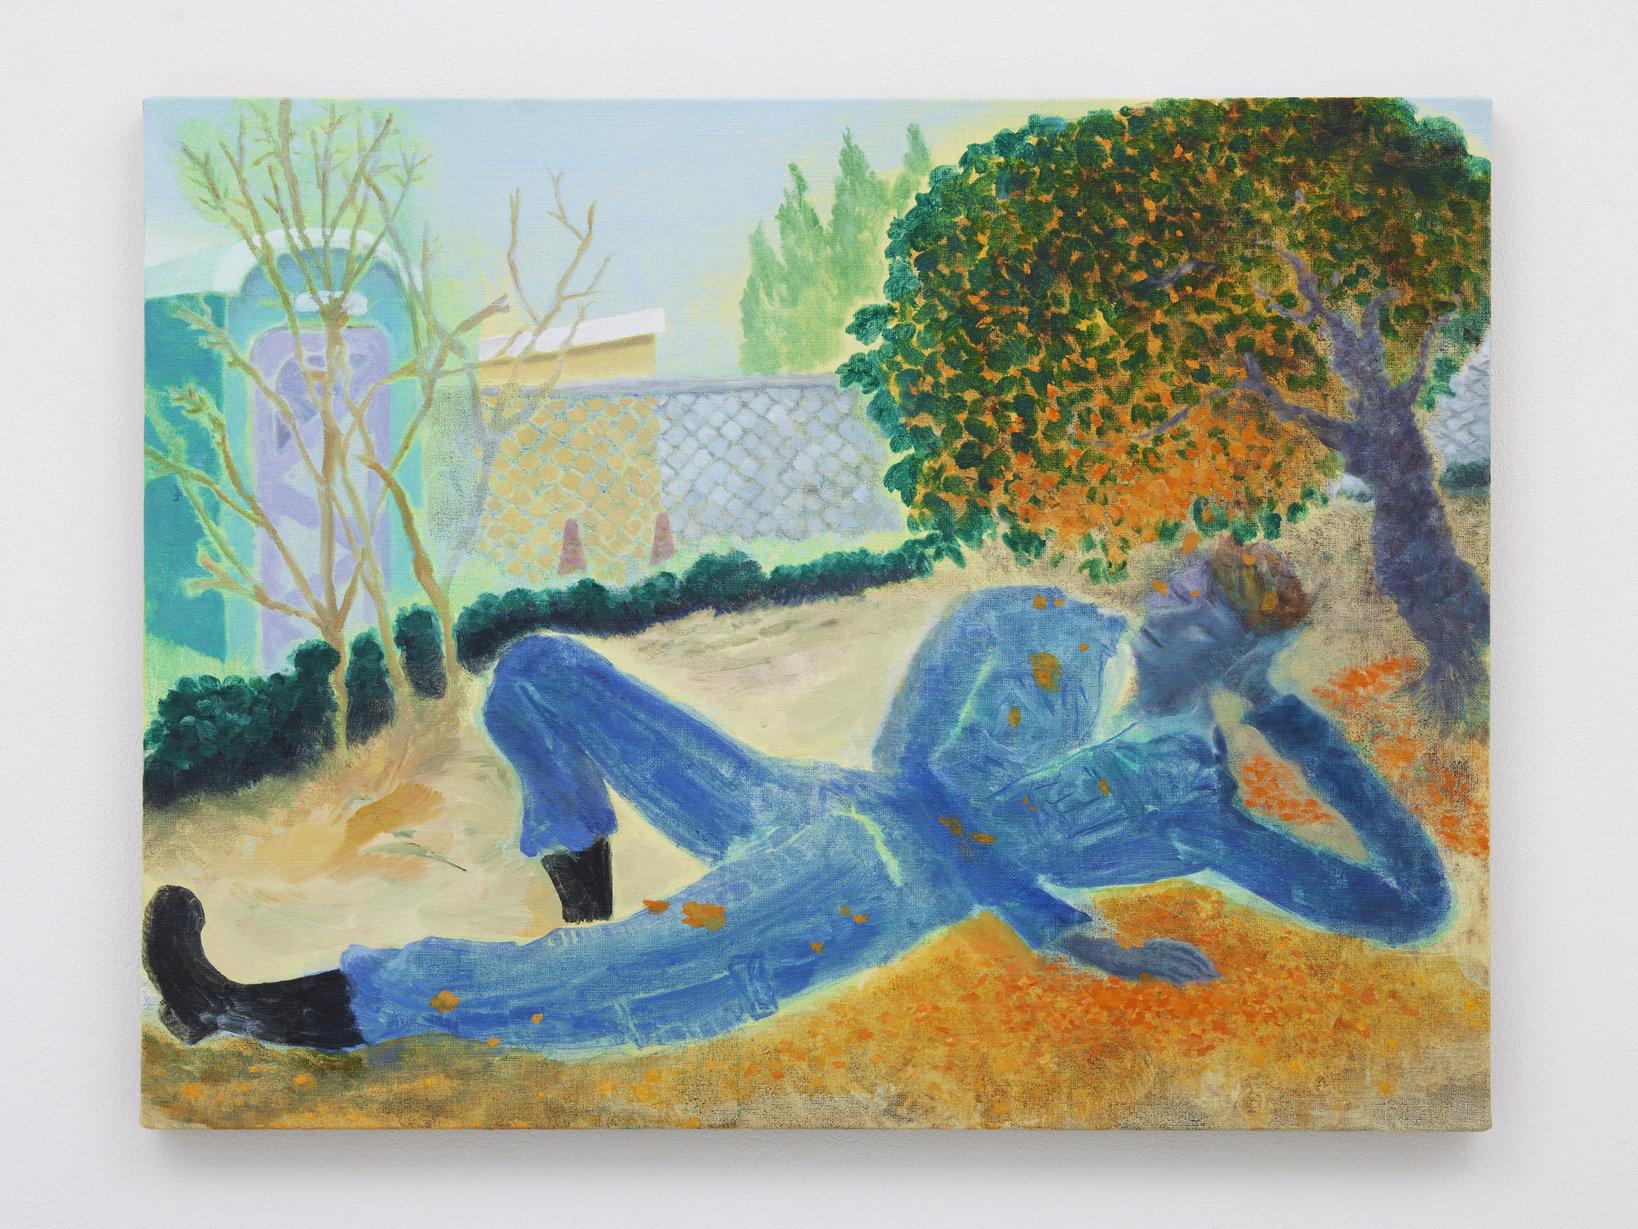 Under the fragrant olive 2020 oil on canvas 50.0 x 65.5 cm ©Daisuke Fukunaga